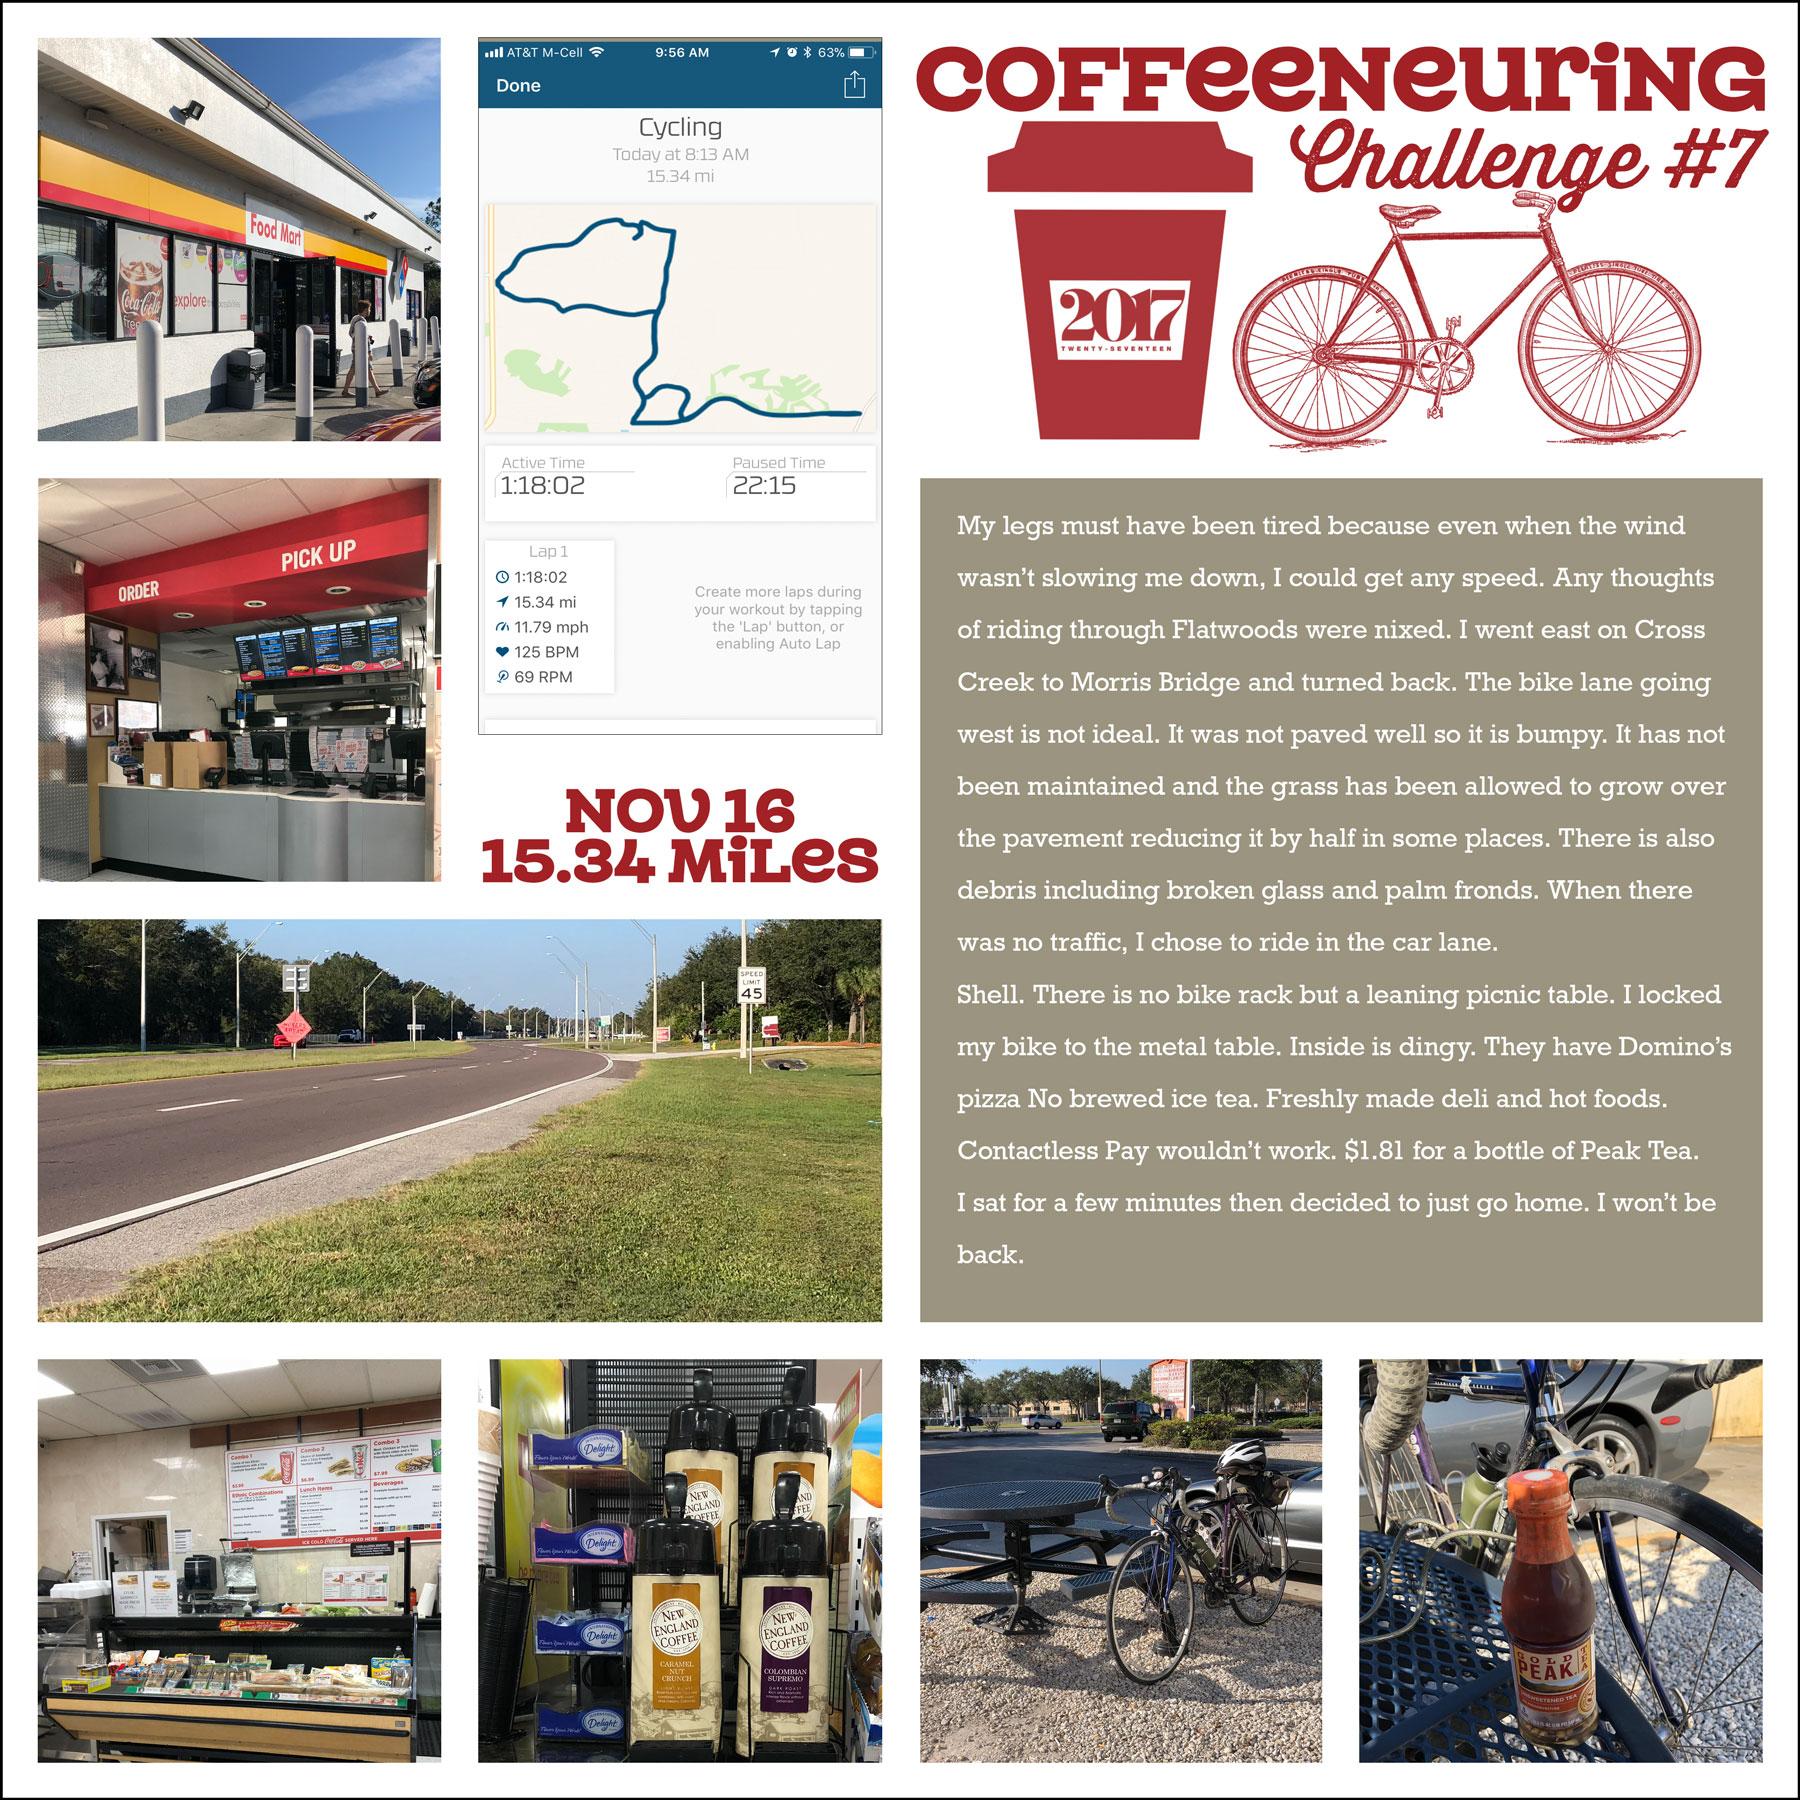 20171116-coffeeneuring.jpg